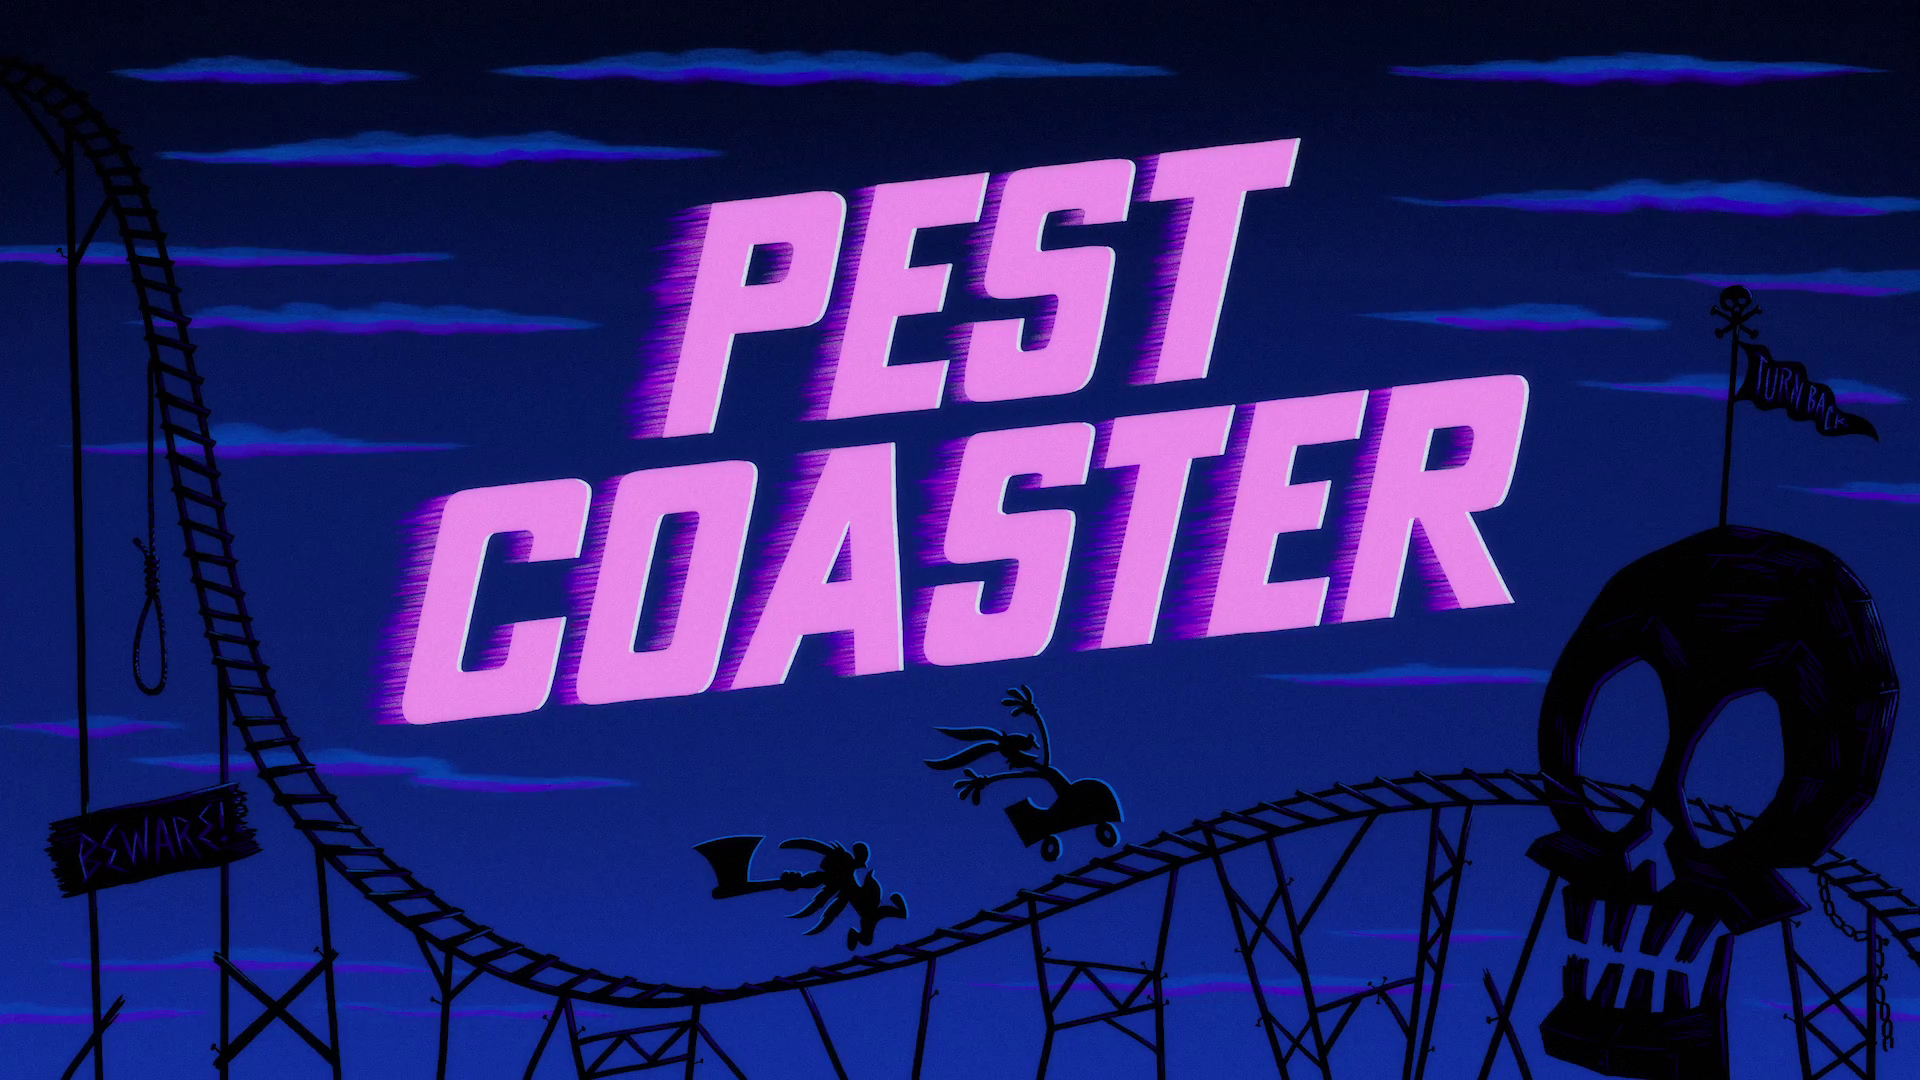 Pest Coaster